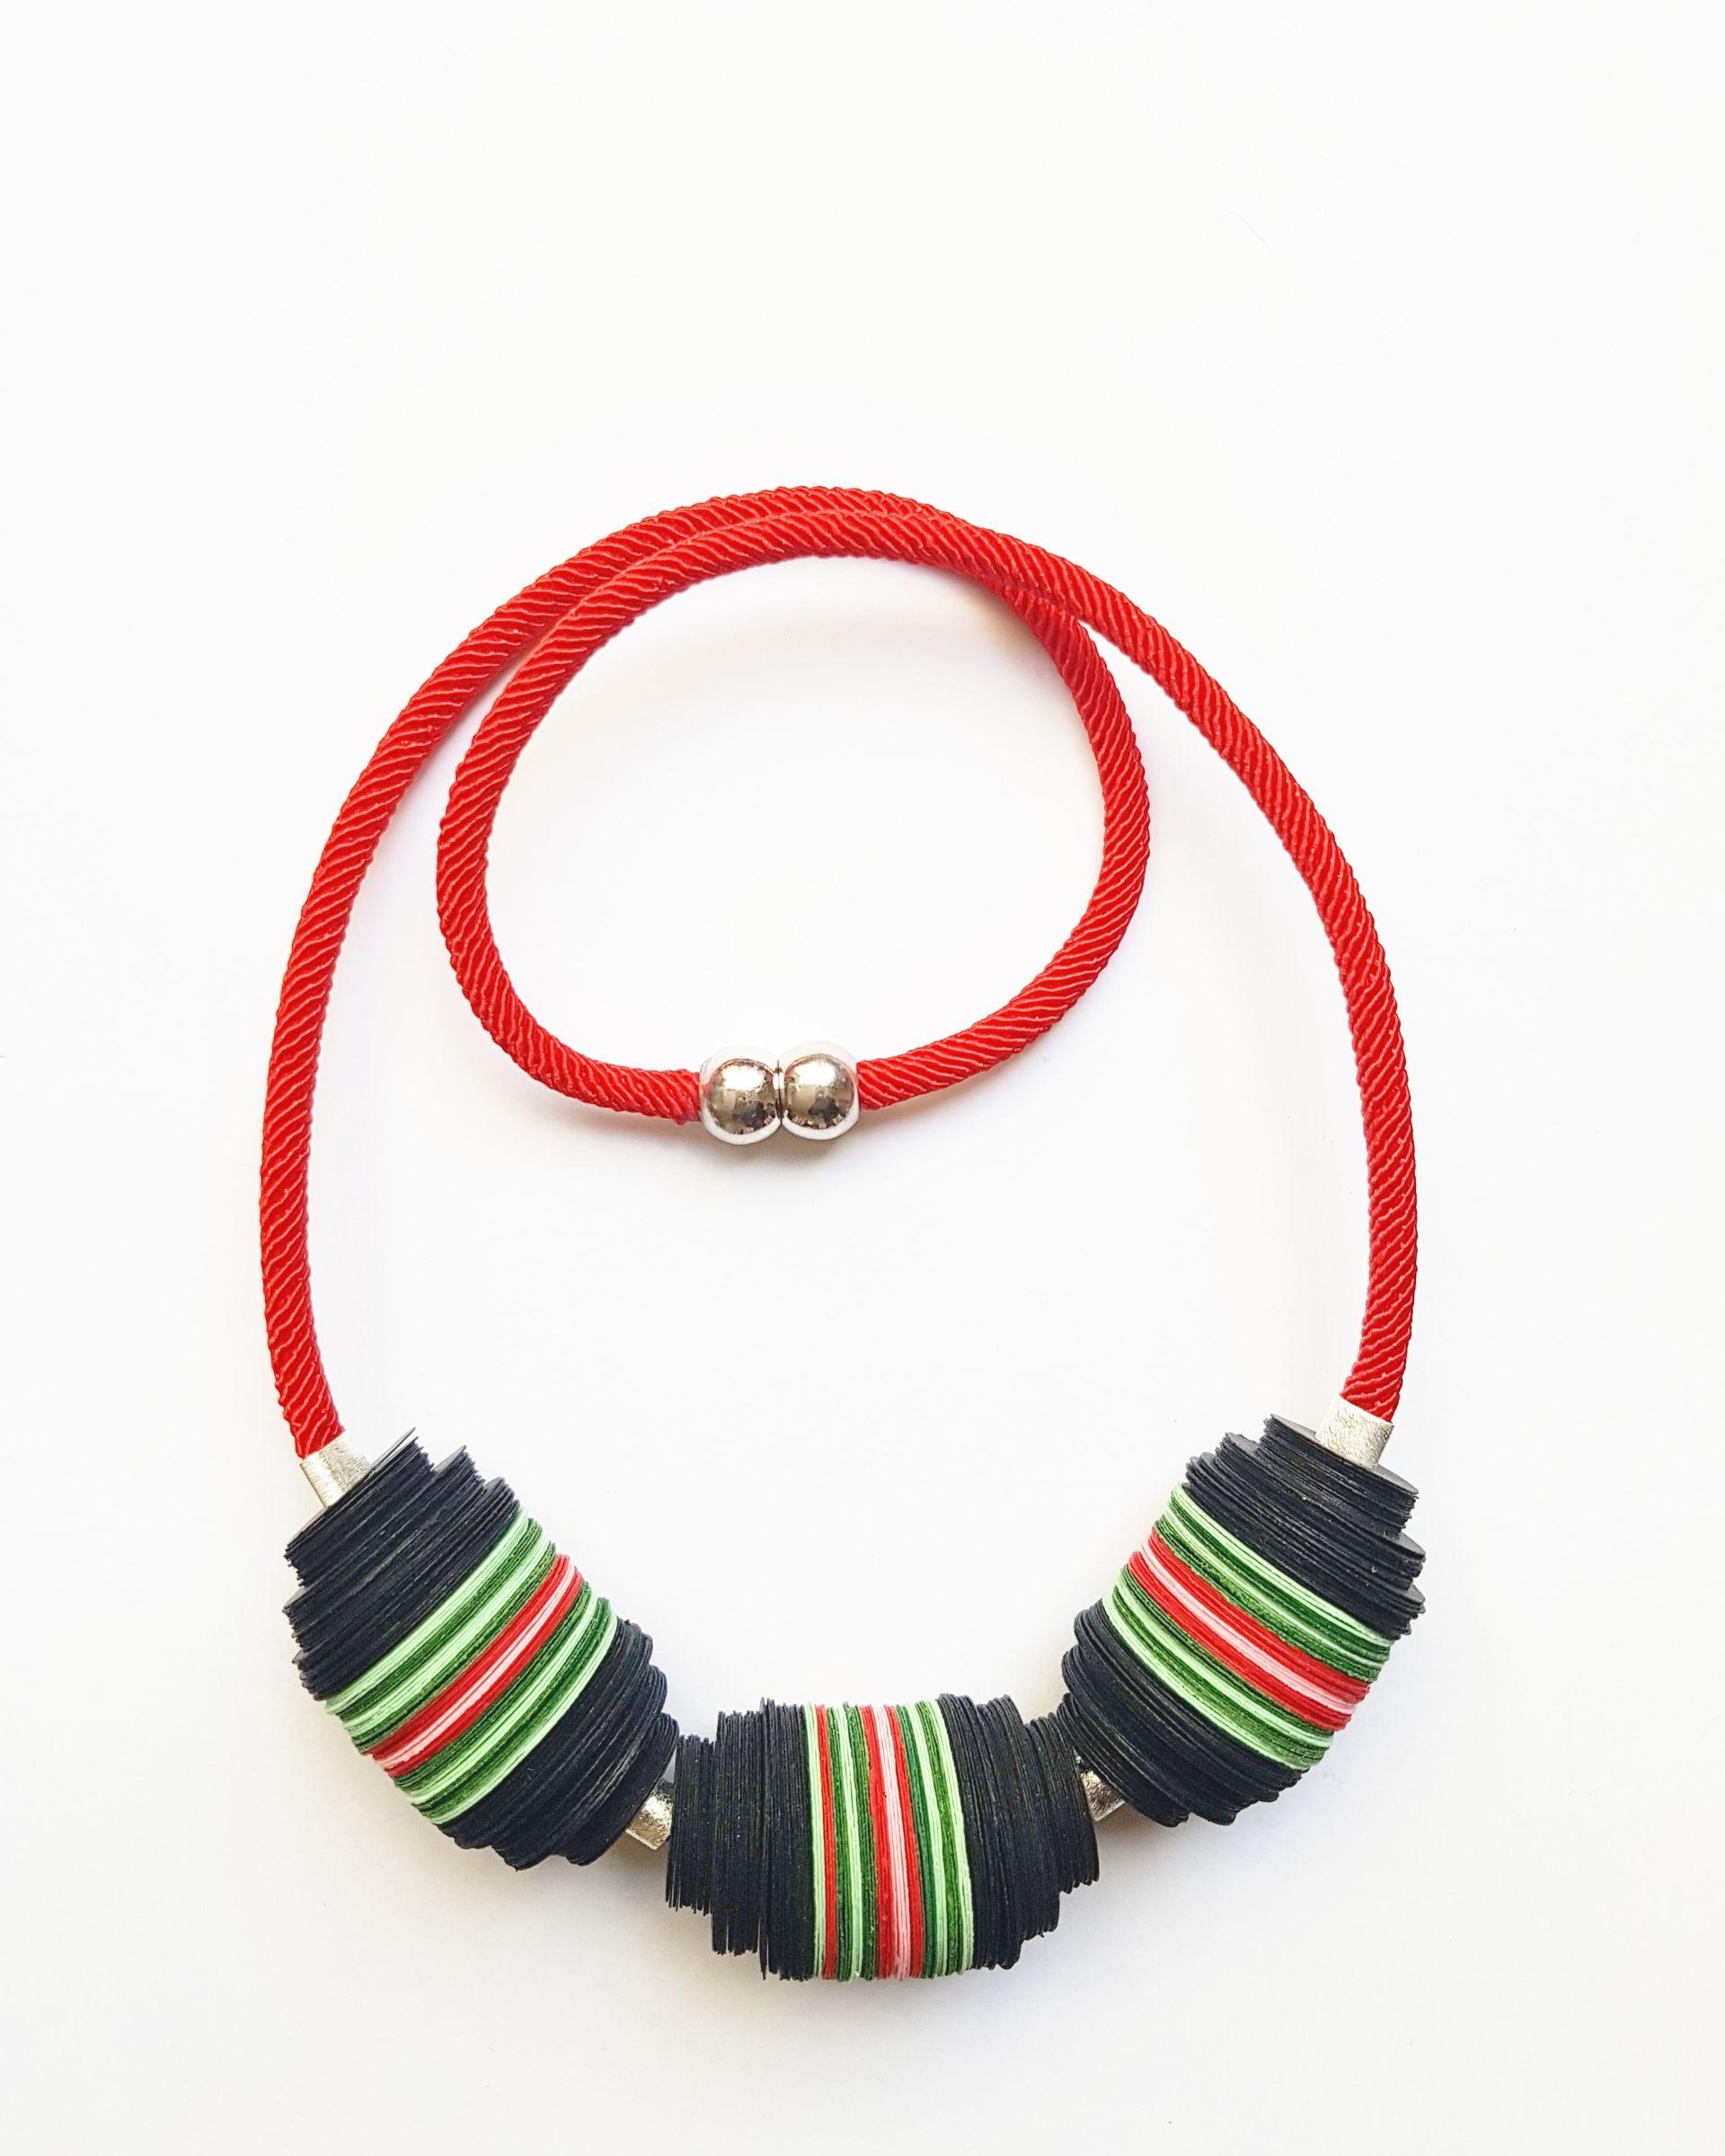 Collar Papel Cuncuna Cordon Rojo - 13 Ciervos